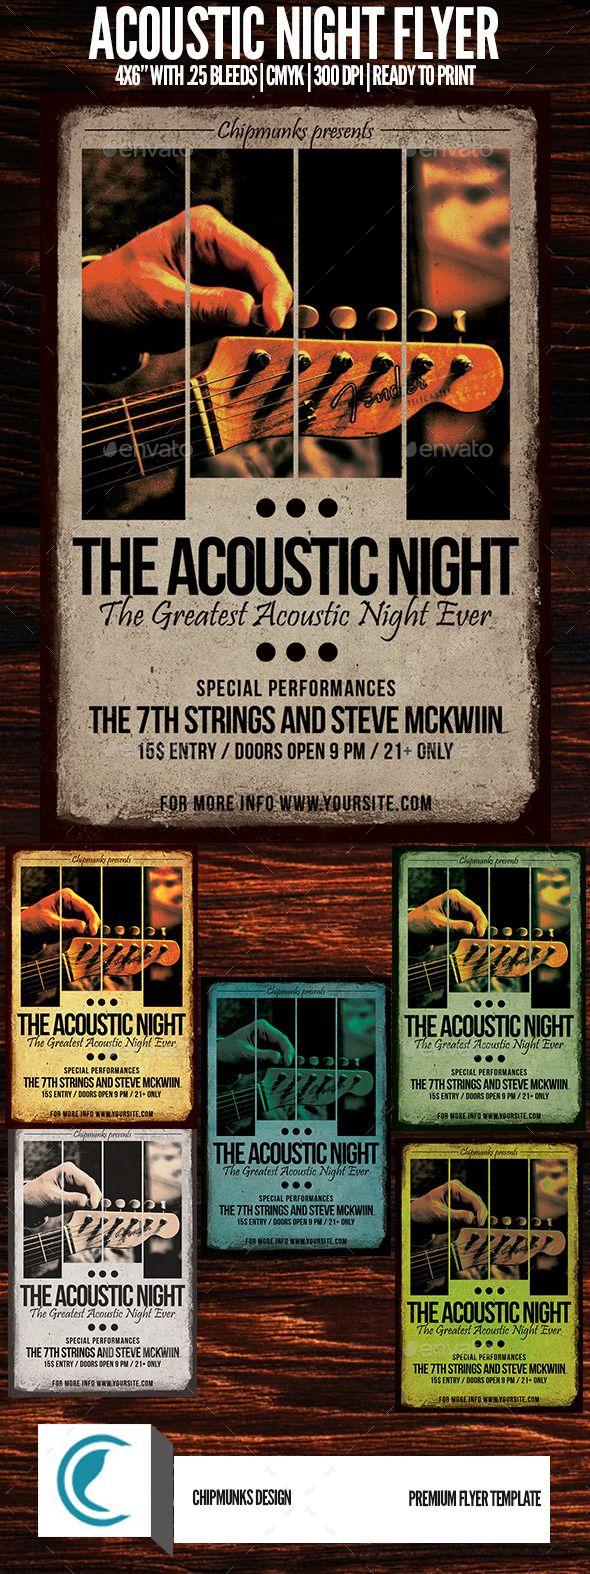 Acoustic Night Flyer. Customizable professional template for a concert flyer. #FlyerTemplate #flyer #concert #GraphicTemplate #design #PrintDesign #acoustic #AcousticFlyer #AcousticMusic #alternative #band #club #event #EventFlyer #festival #gig #grunge #indie #IndieBand #IndieFlyer #music #night #party #poster #PrintTemplate #rock #RockMusic #typography #UnpluggedGig #urban